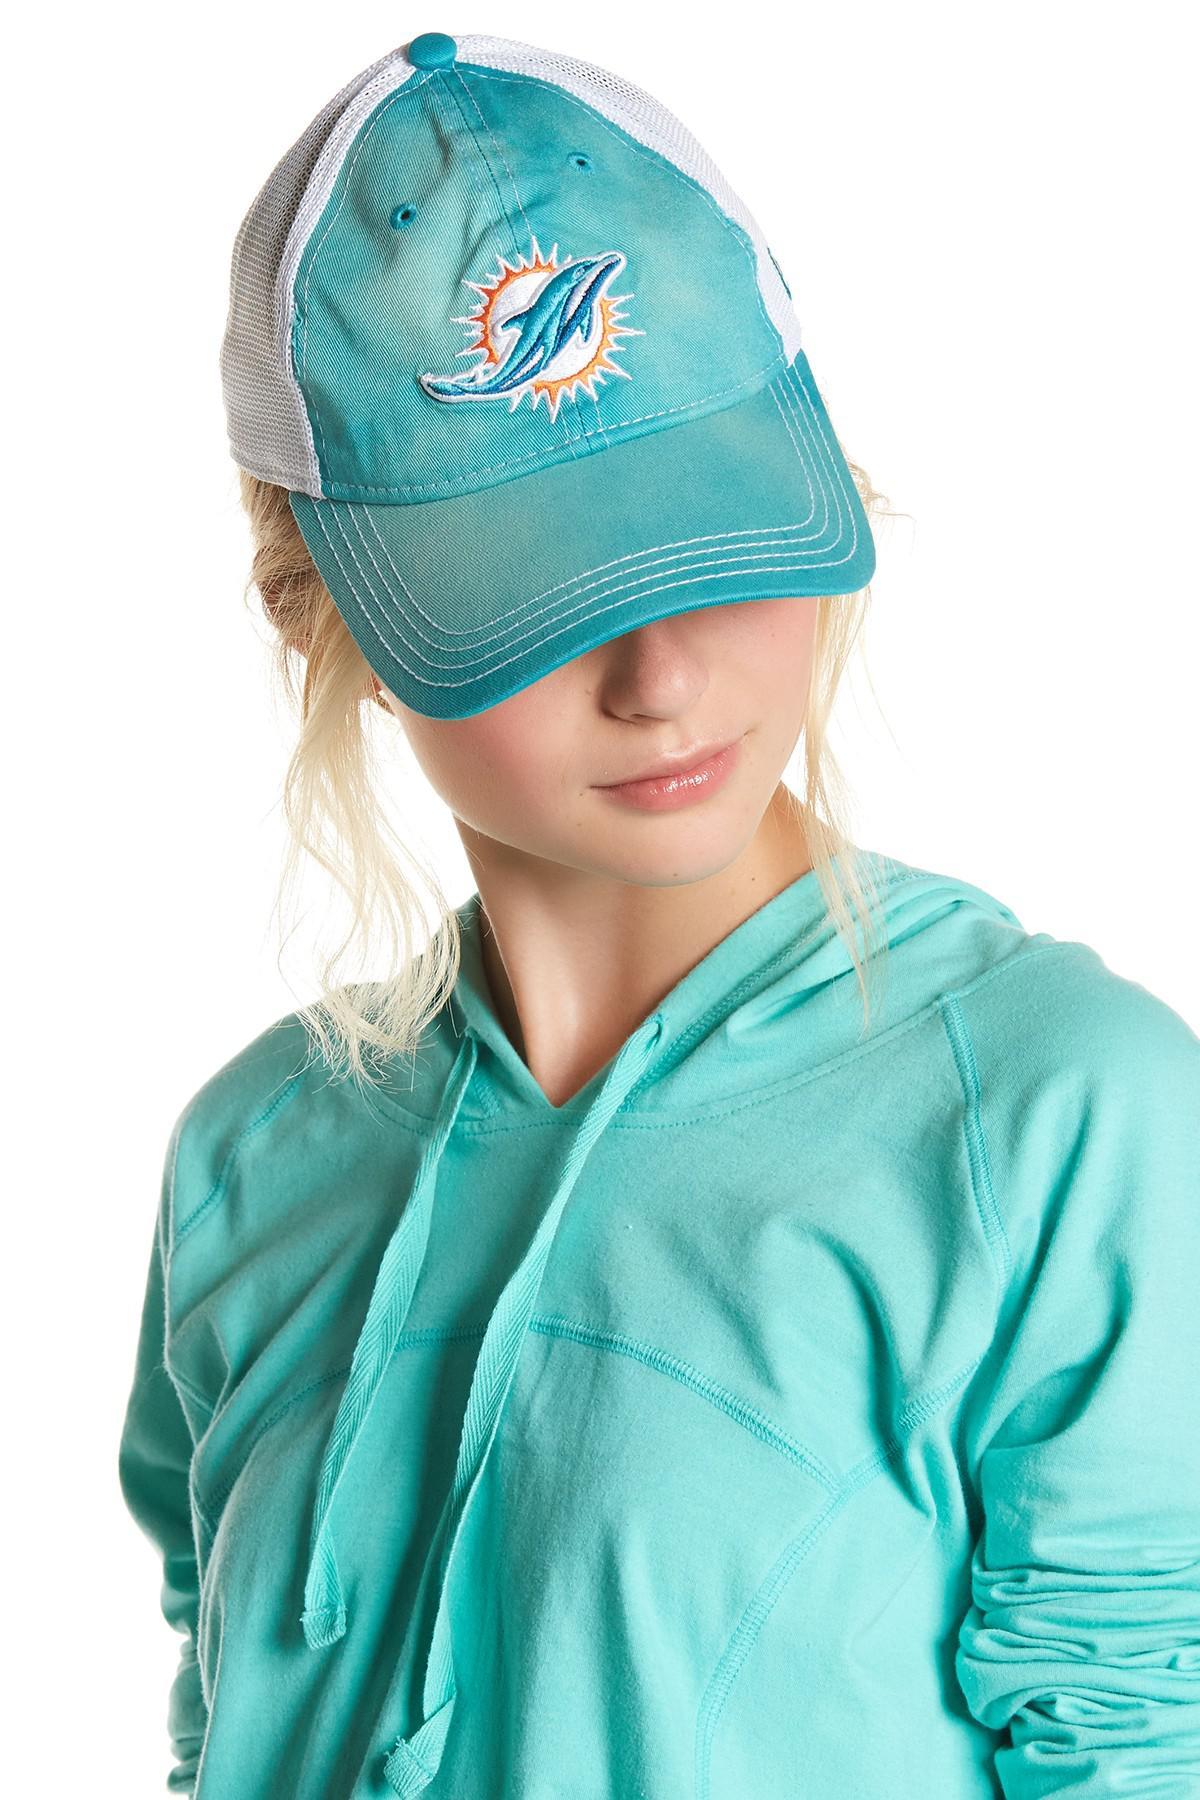 7b81ec05842f5 ... block knit floppy hat cth8095 lyst ce45f 07441  hot lyst ktz miami  dolphins baseball cap in blue 628b8 55e85